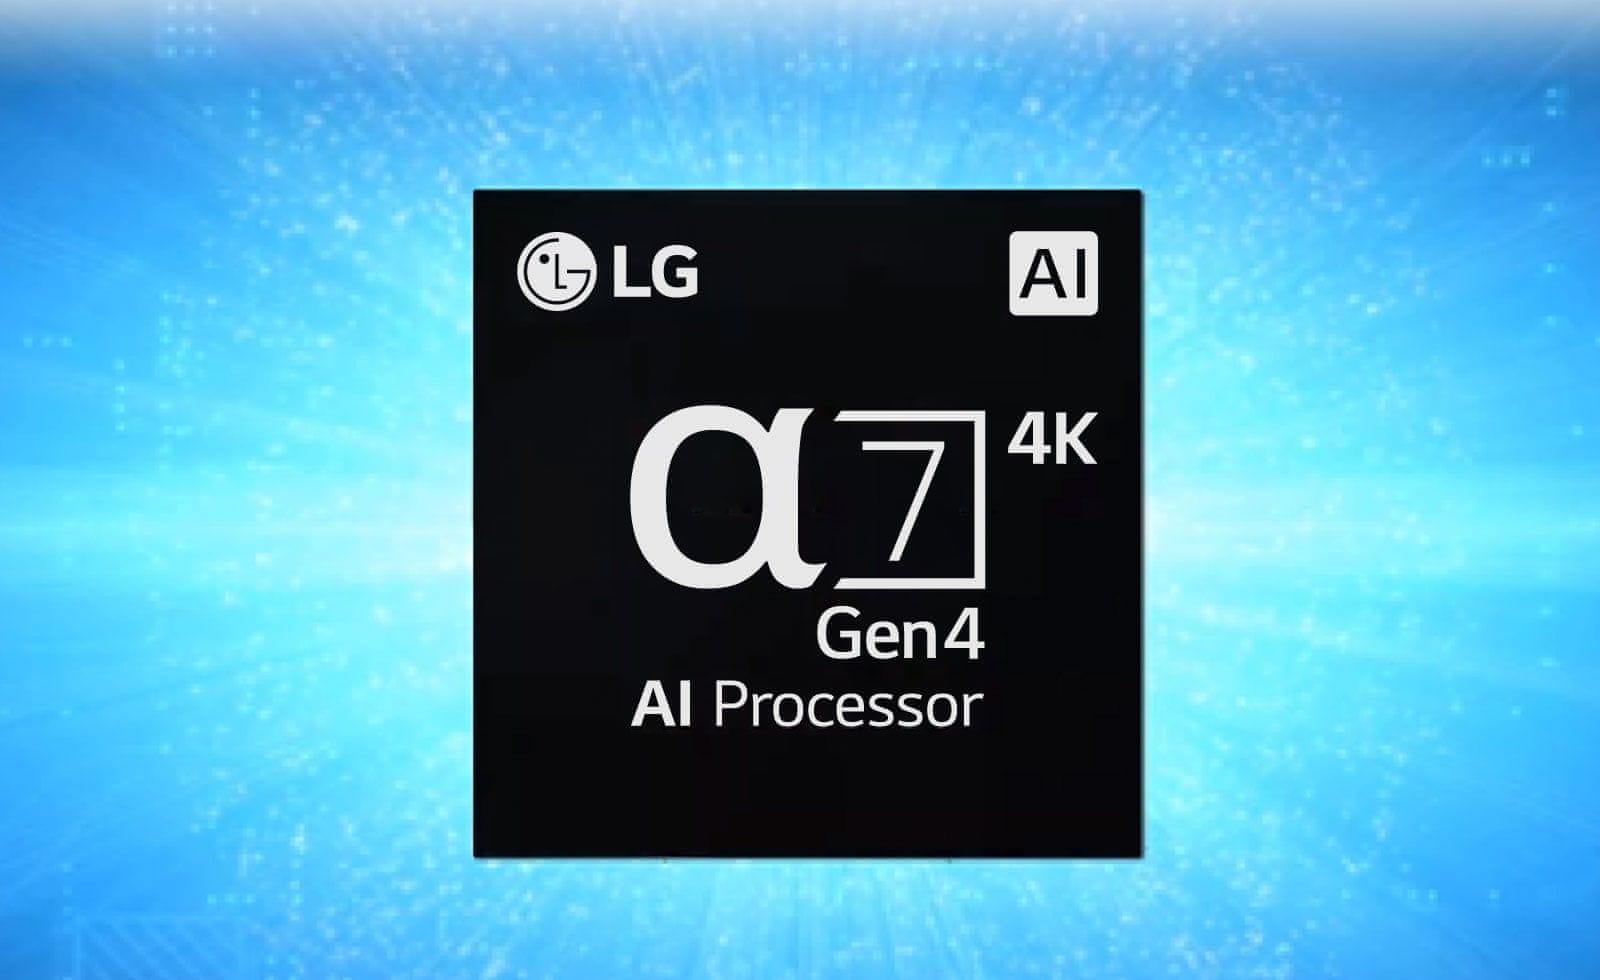 LG TV televízió NANOCELL 4K 2021 processzor α7 4K Gen4 AI